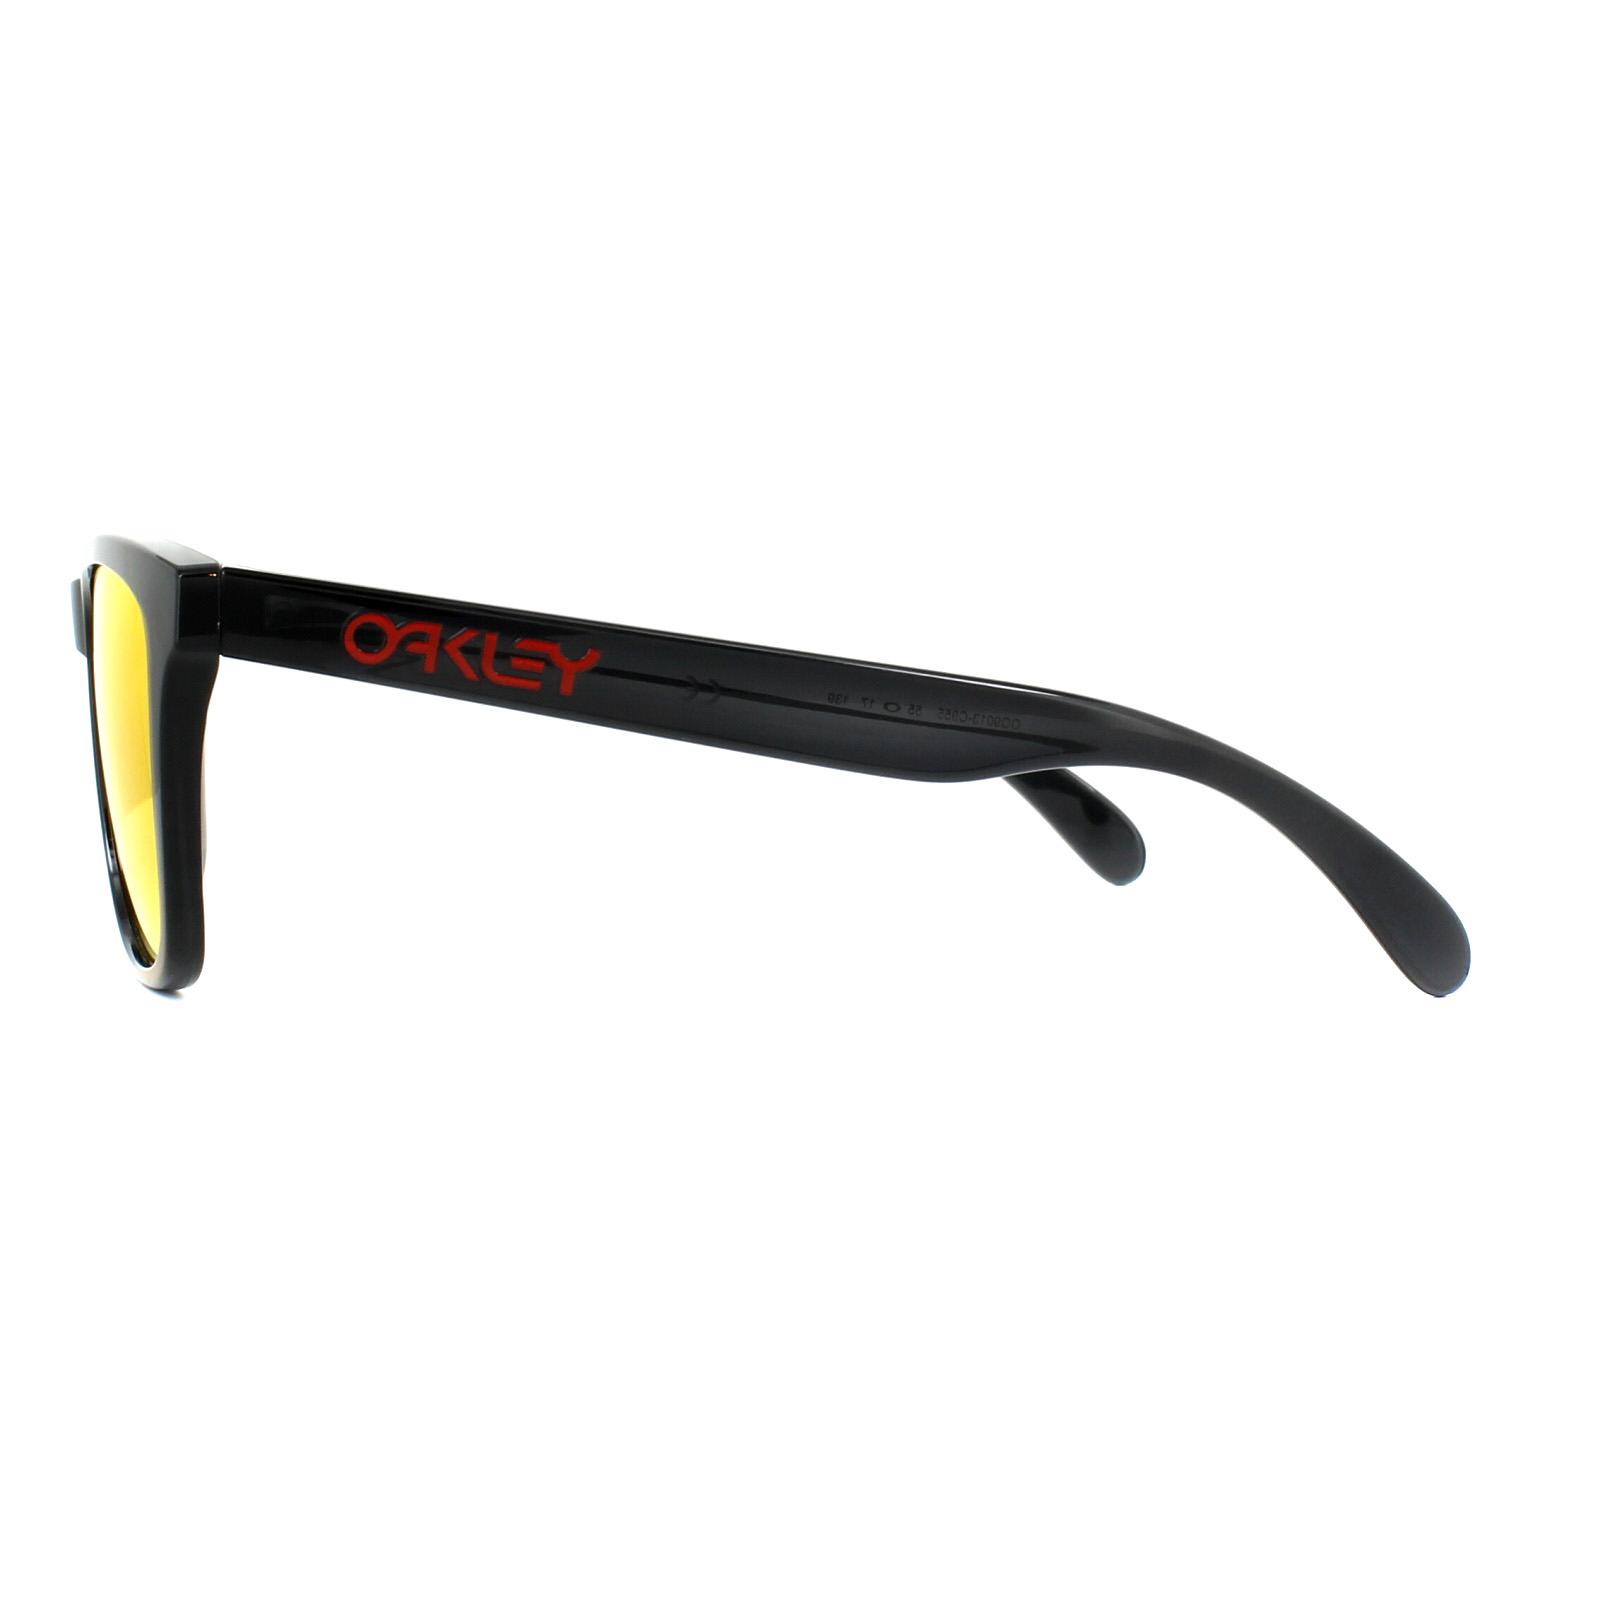 0d38e8eb2ac Sentinel Oakley Sunglasses Frogskins OO9013-C9 Black Ink Prizm Ruby